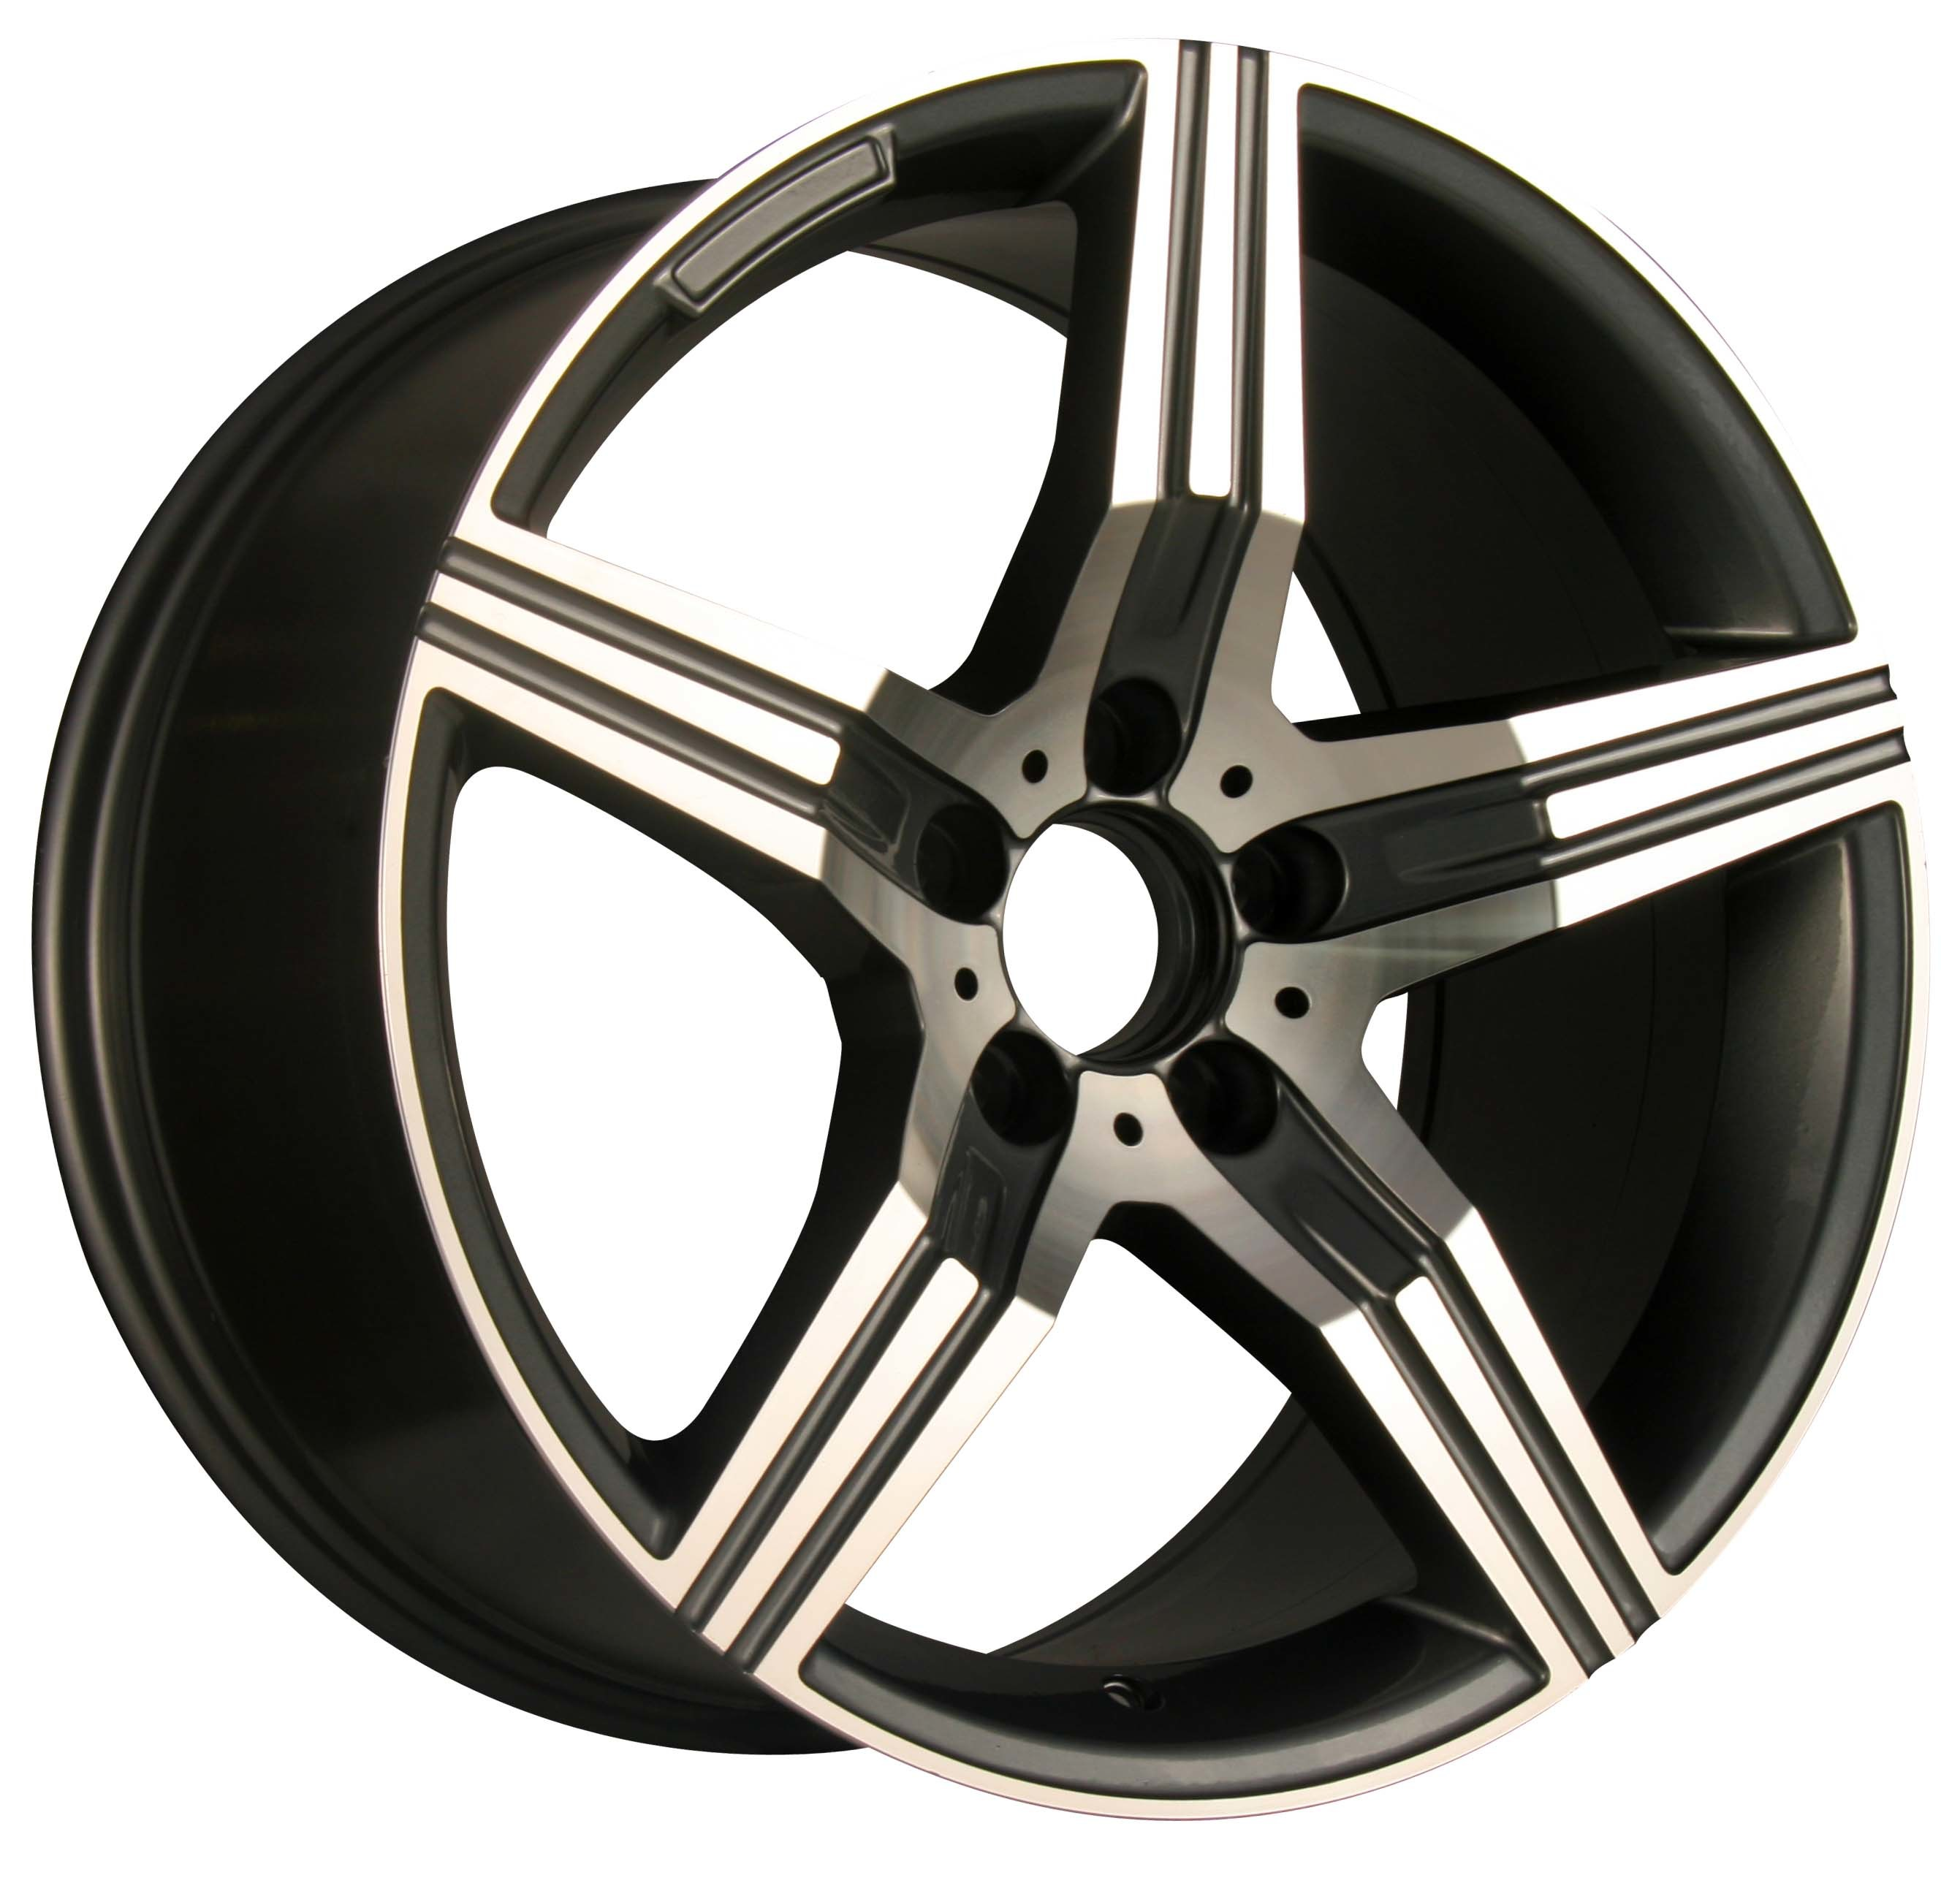 17inch Alloy Wheel Replica Wheel for Benz 2014 Amg S63